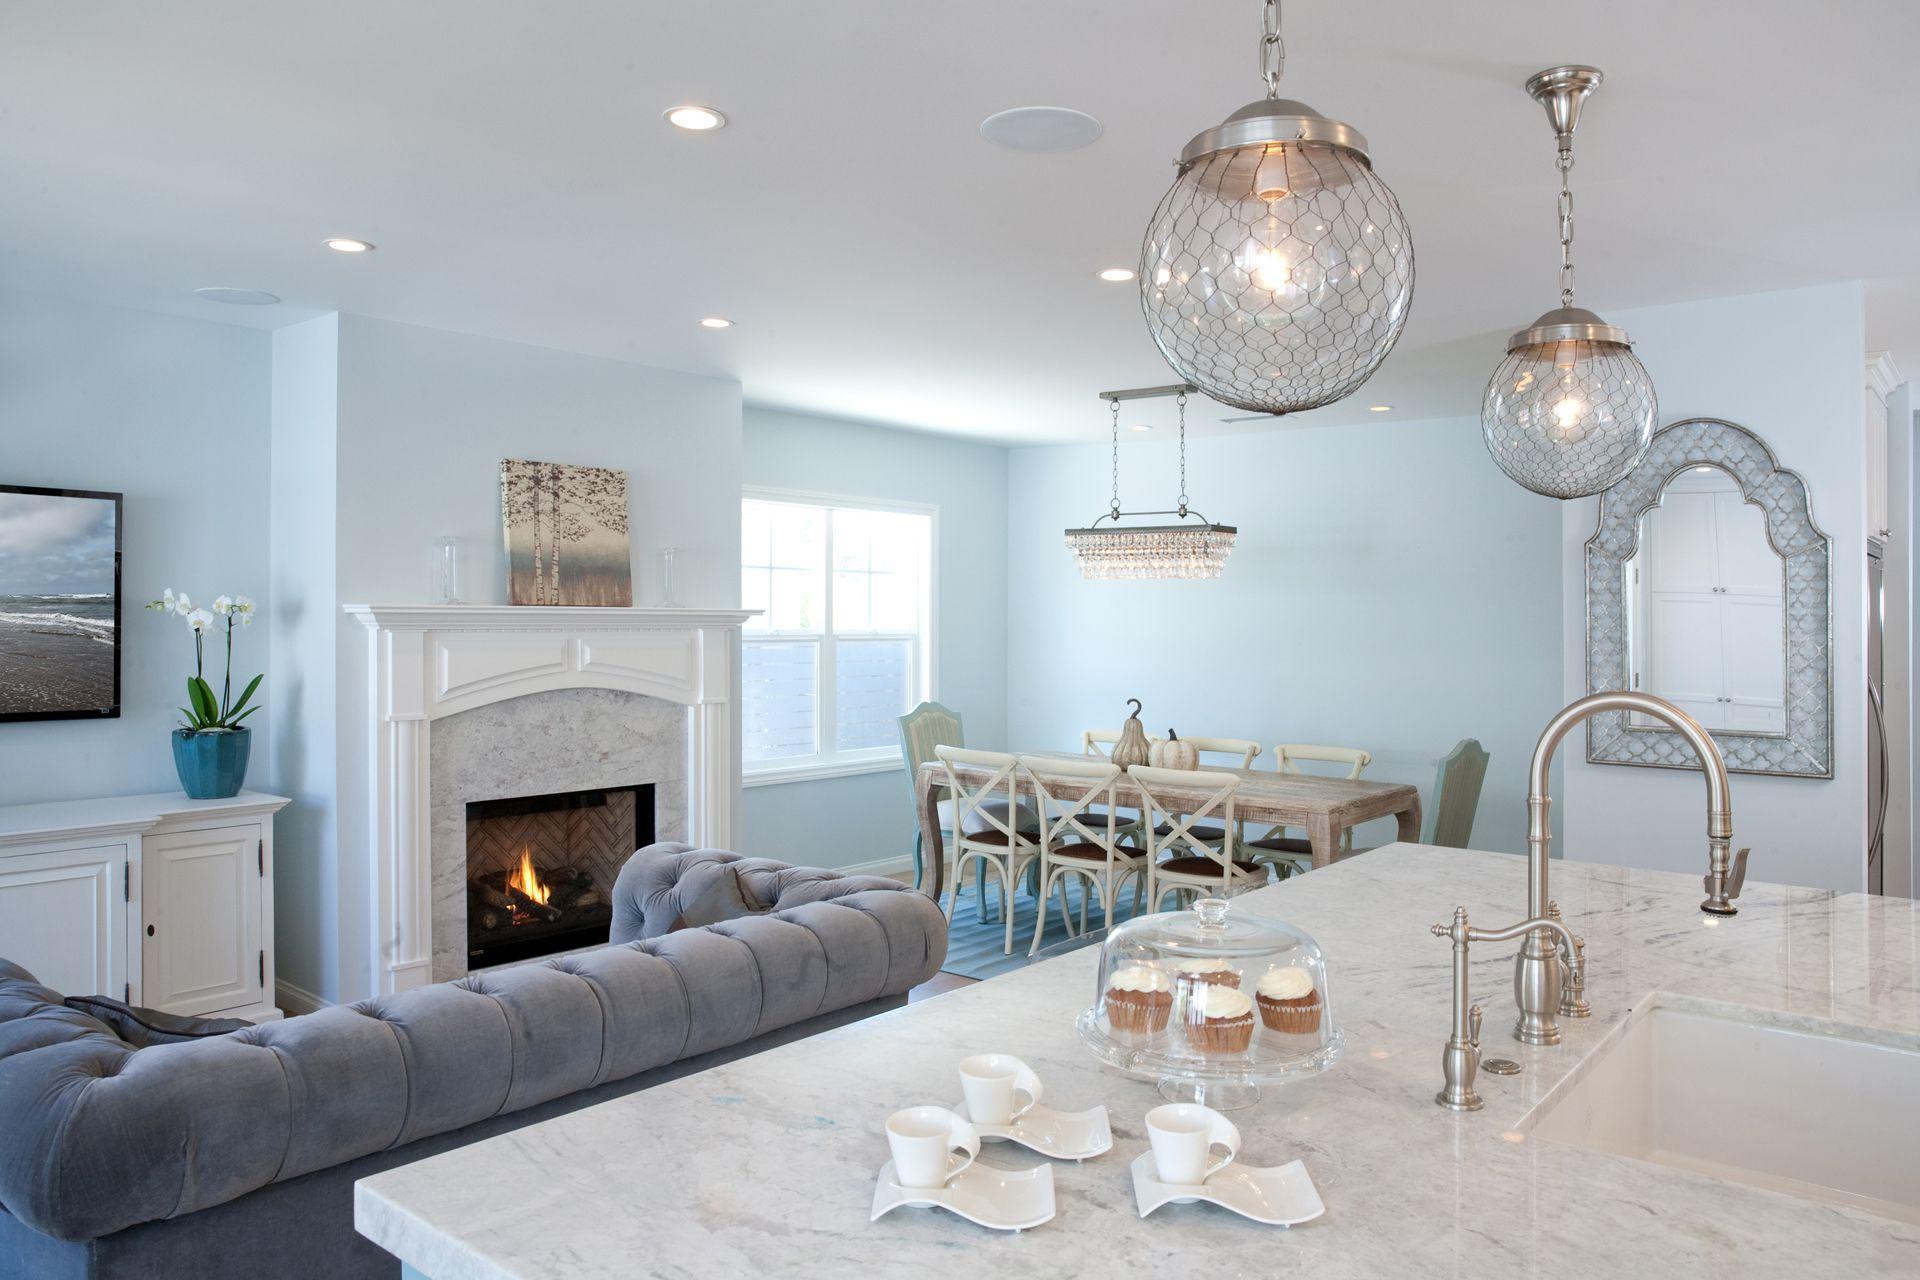 16 Beautiful Marble Kitchen Countertops